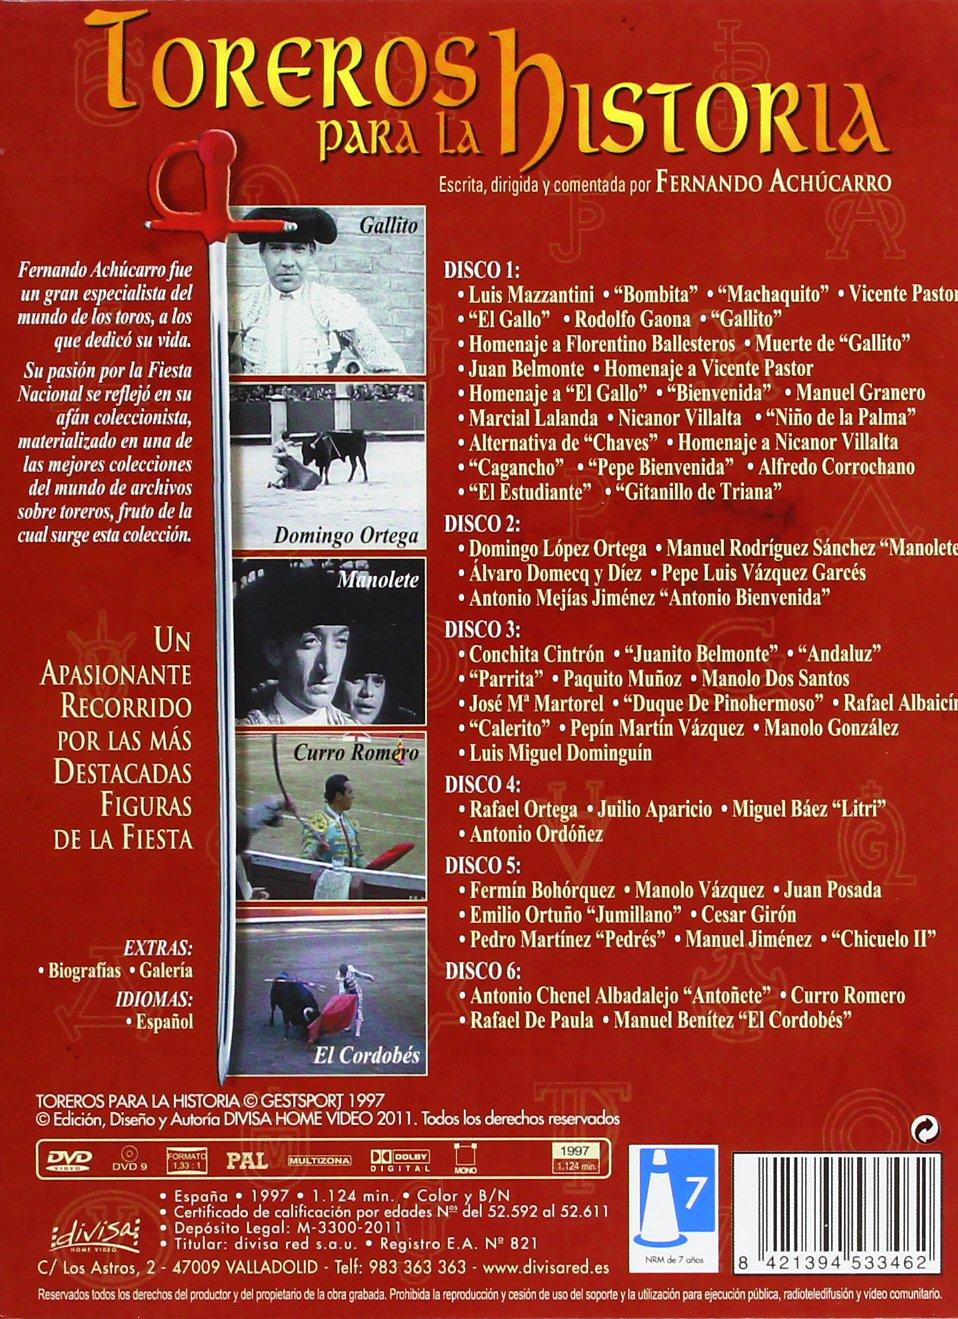 Amazon.com: Toreros Para La Historia (6 Dvd) [DVD] (2011) Fernando Achucarro: Movies & TV